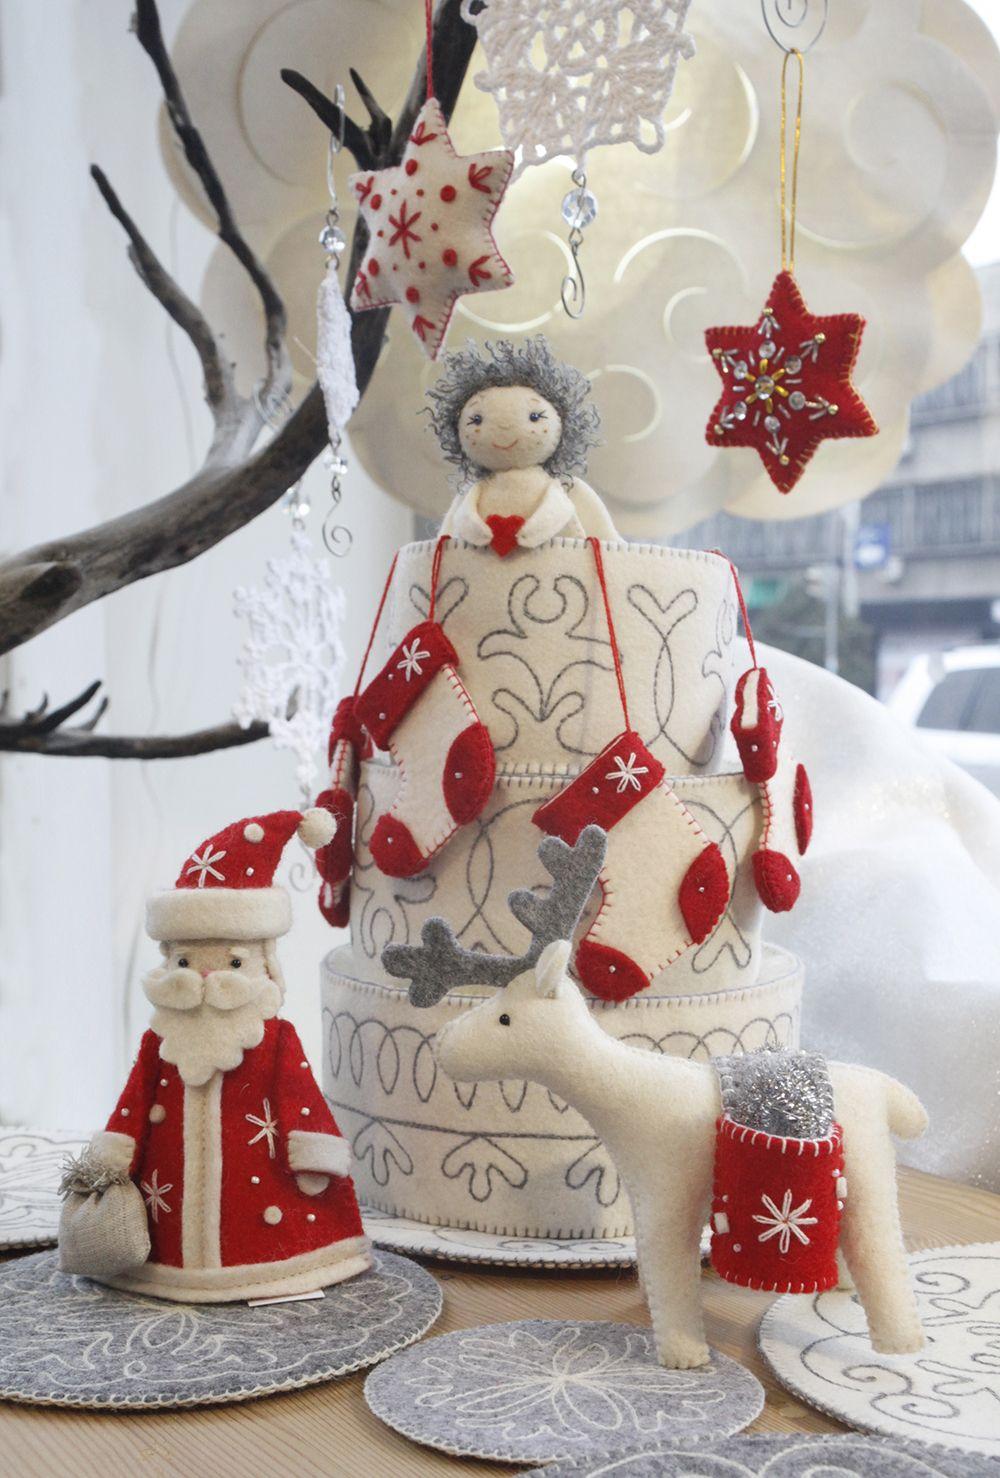 Holiday Mood In Tumar Art Salon In Bishkek. Handmade Items